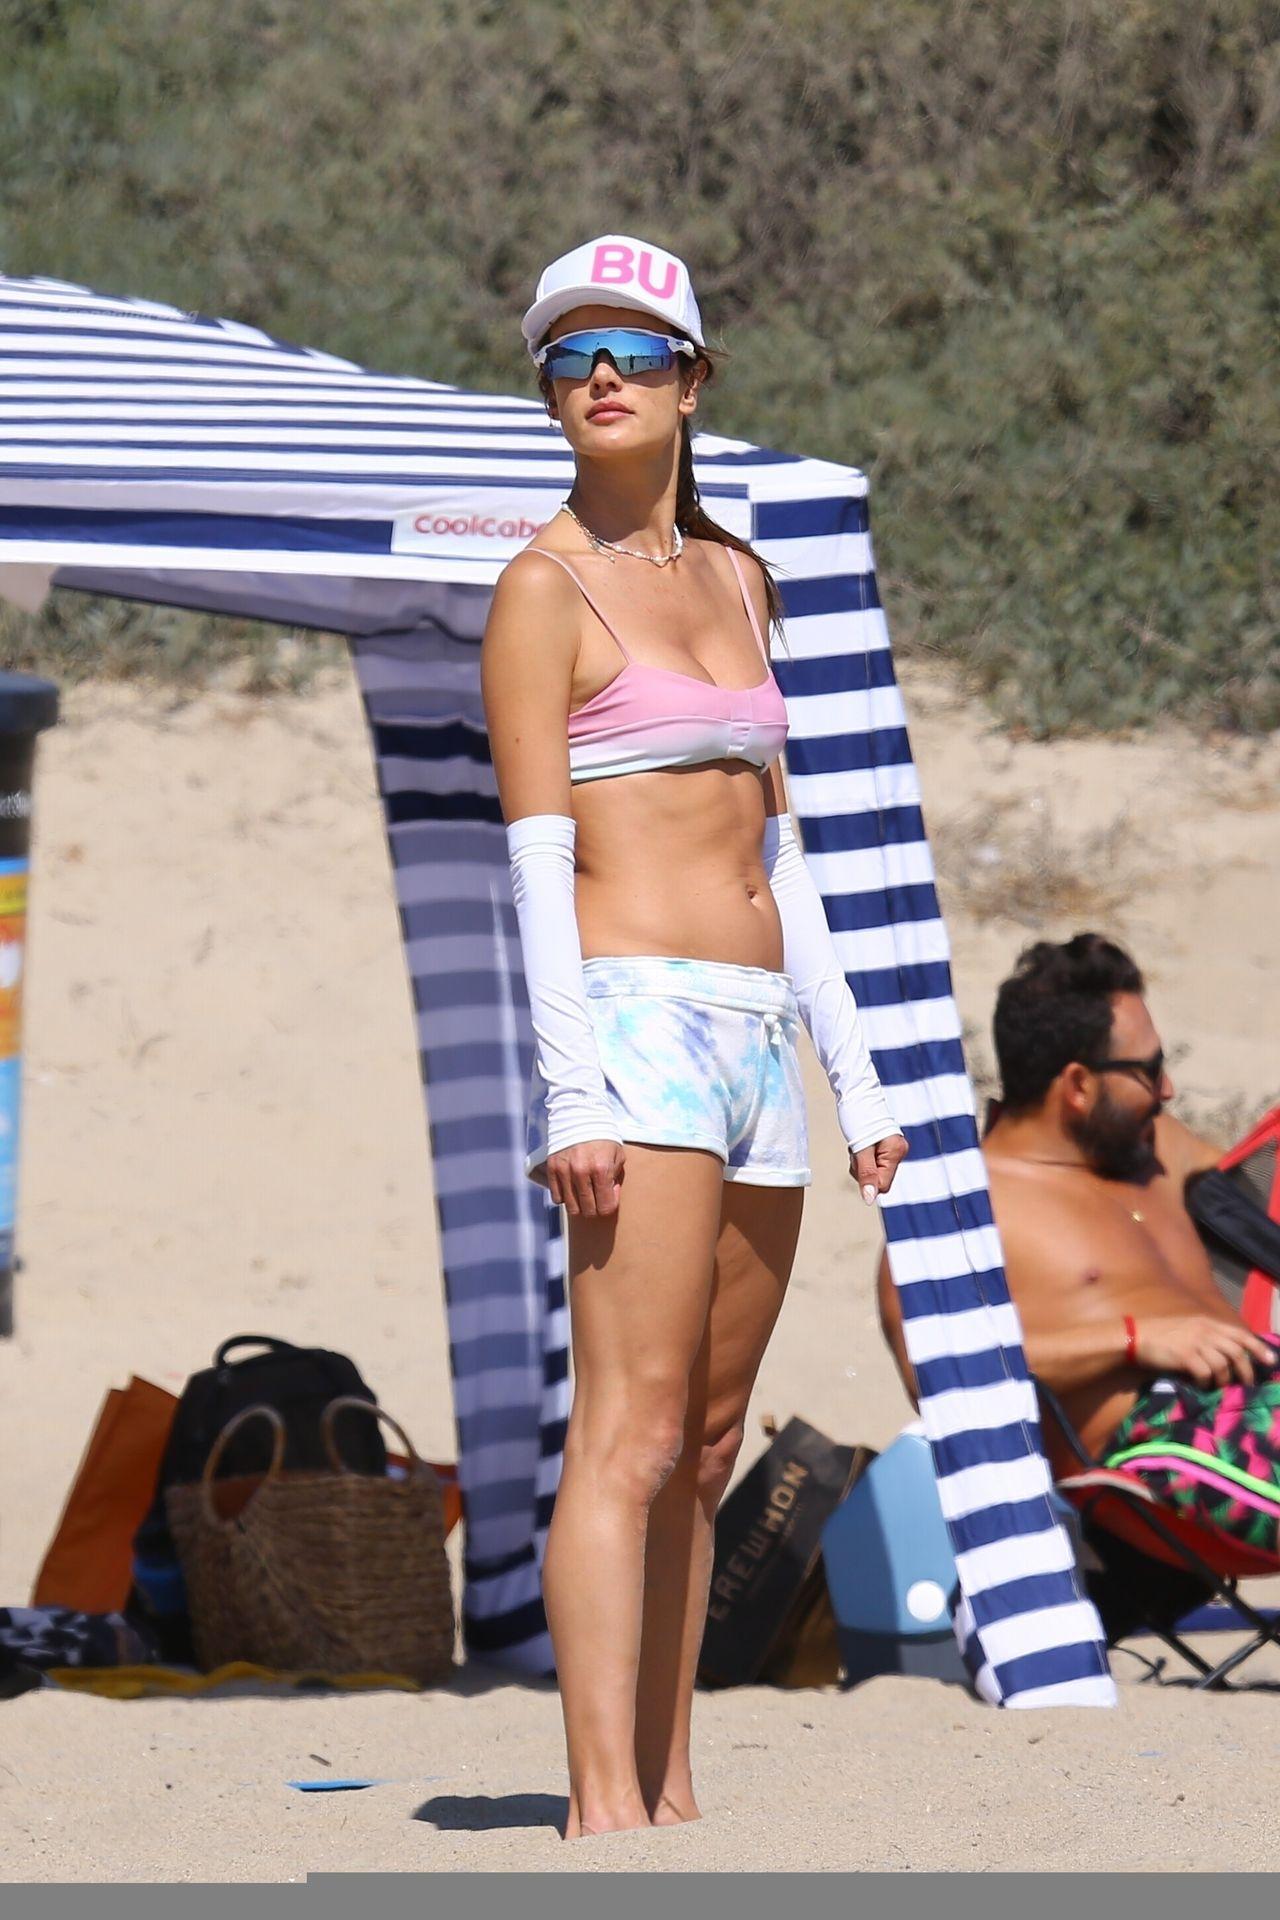 Alessandra-Ambrosio-Sexy-The-Fappening-Blog-8-2.jpg